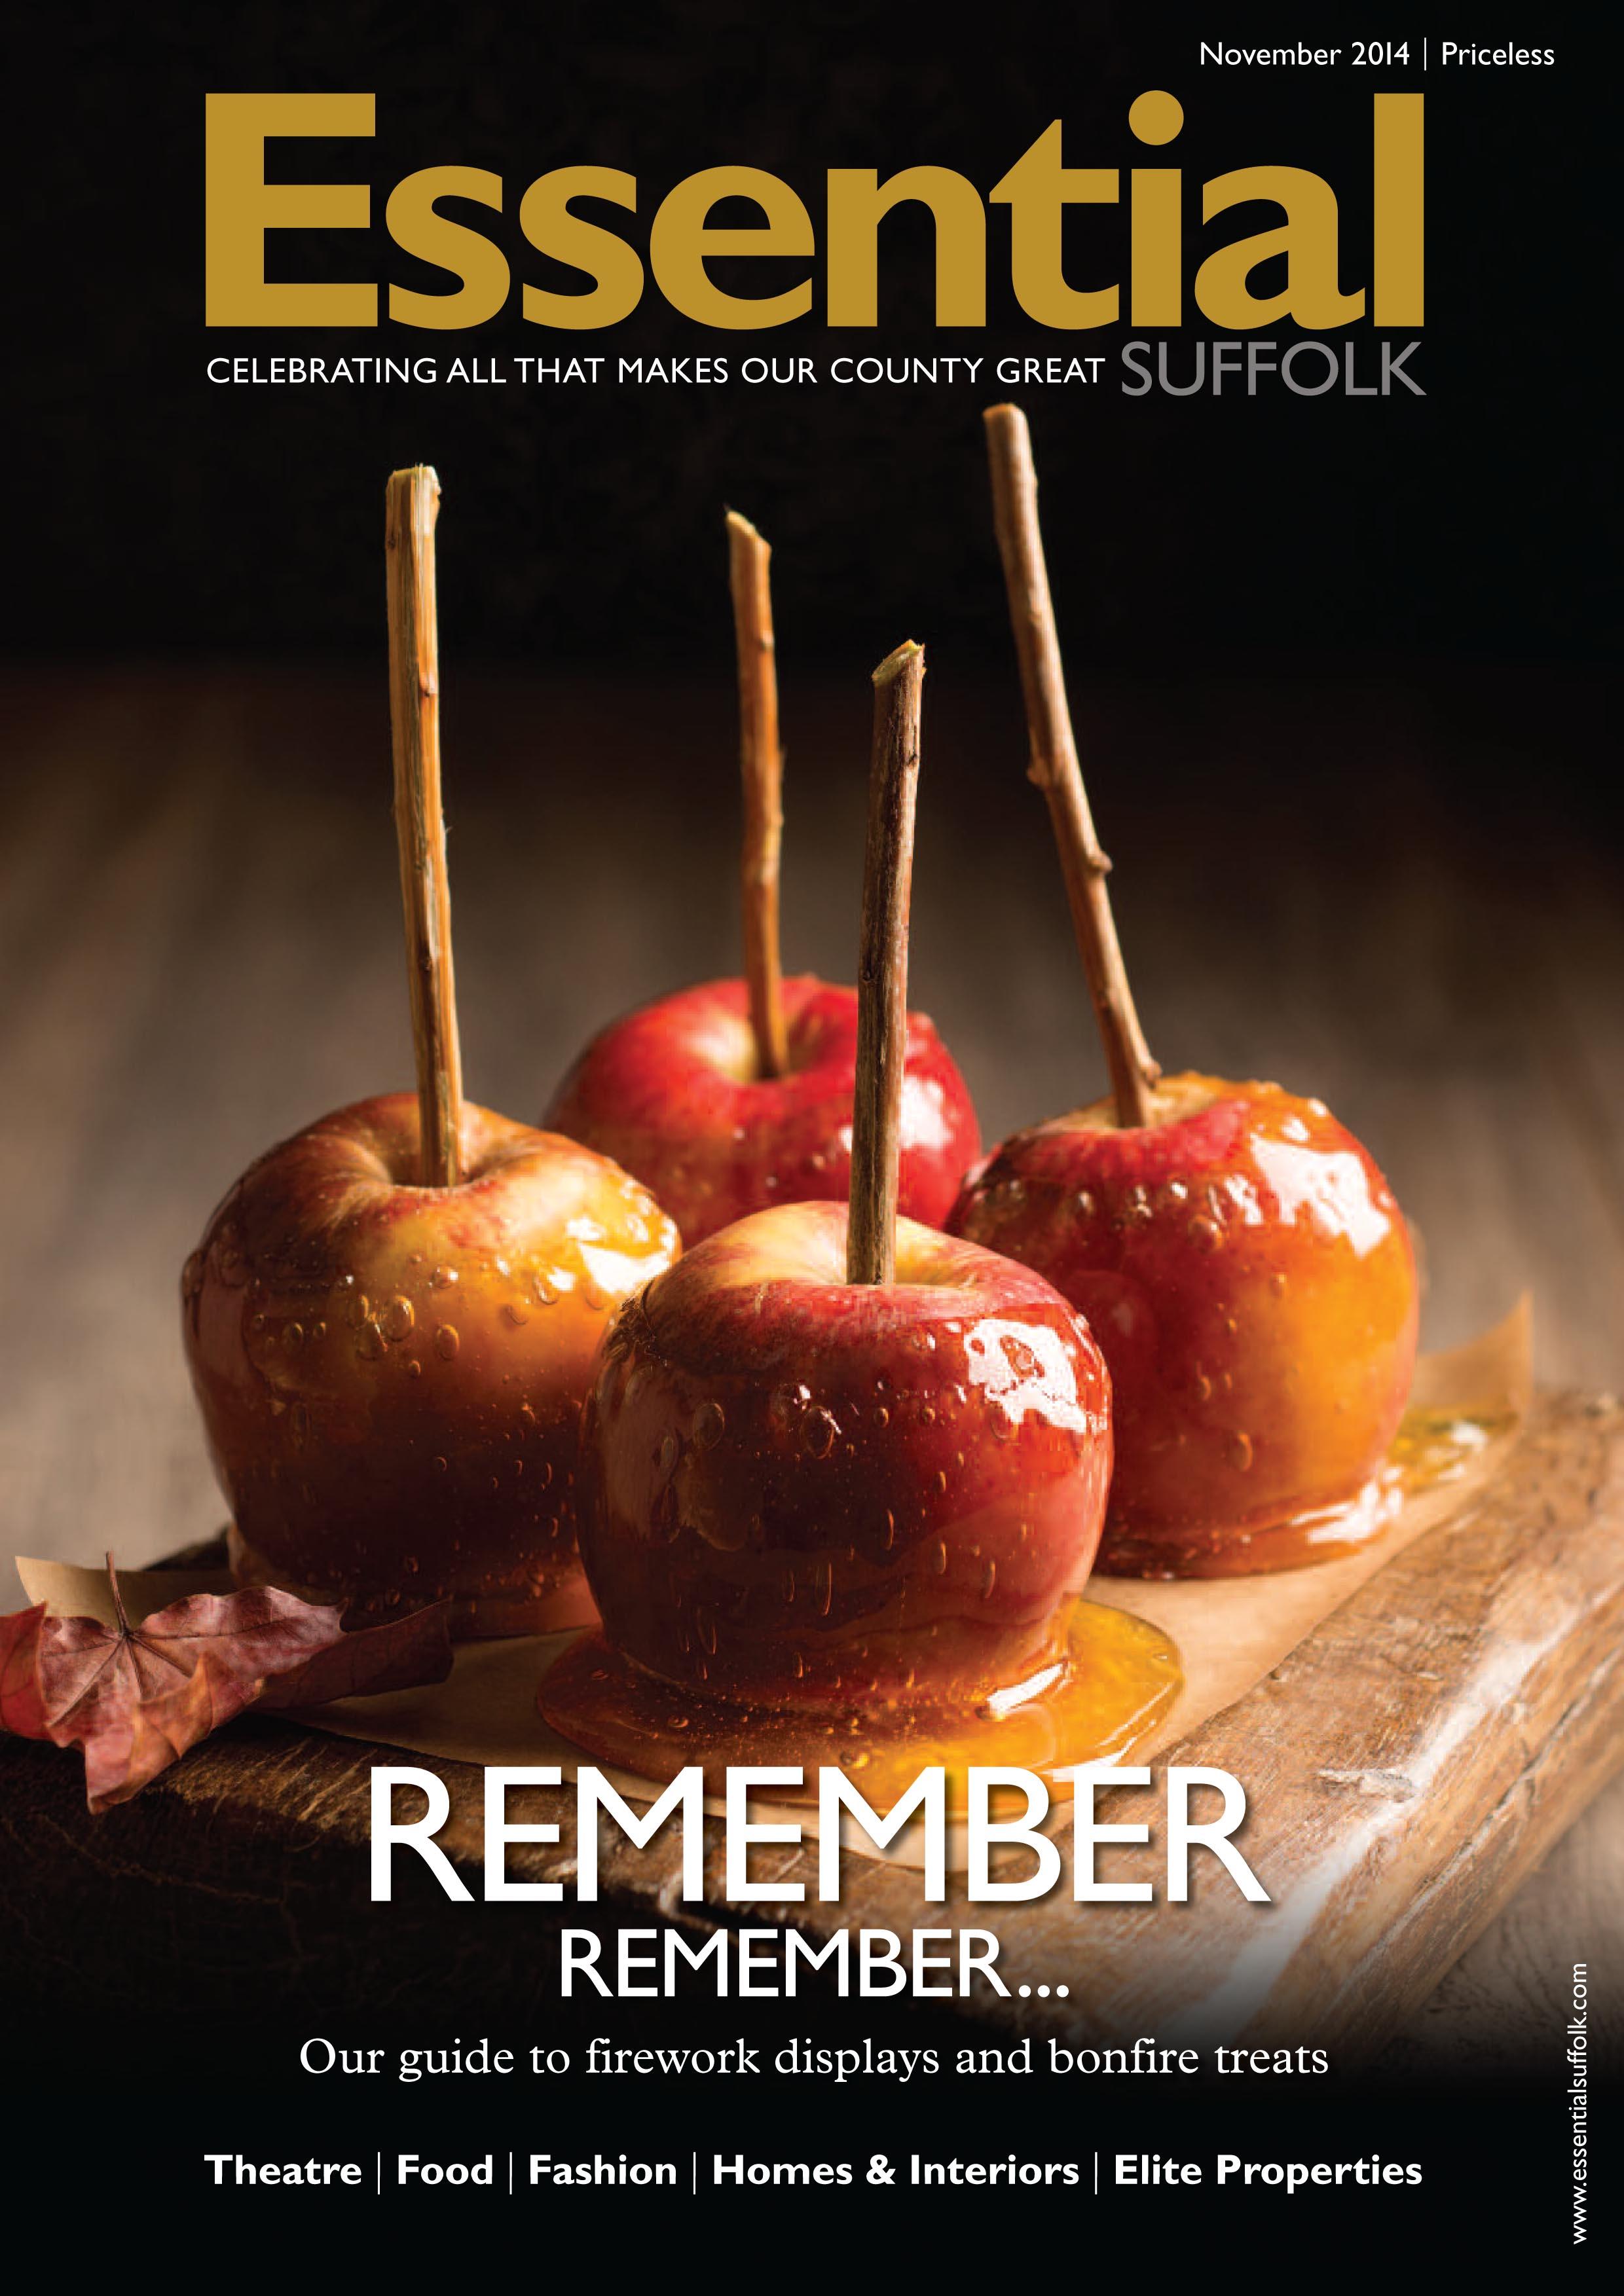 Essential Suffolk cover.jpg